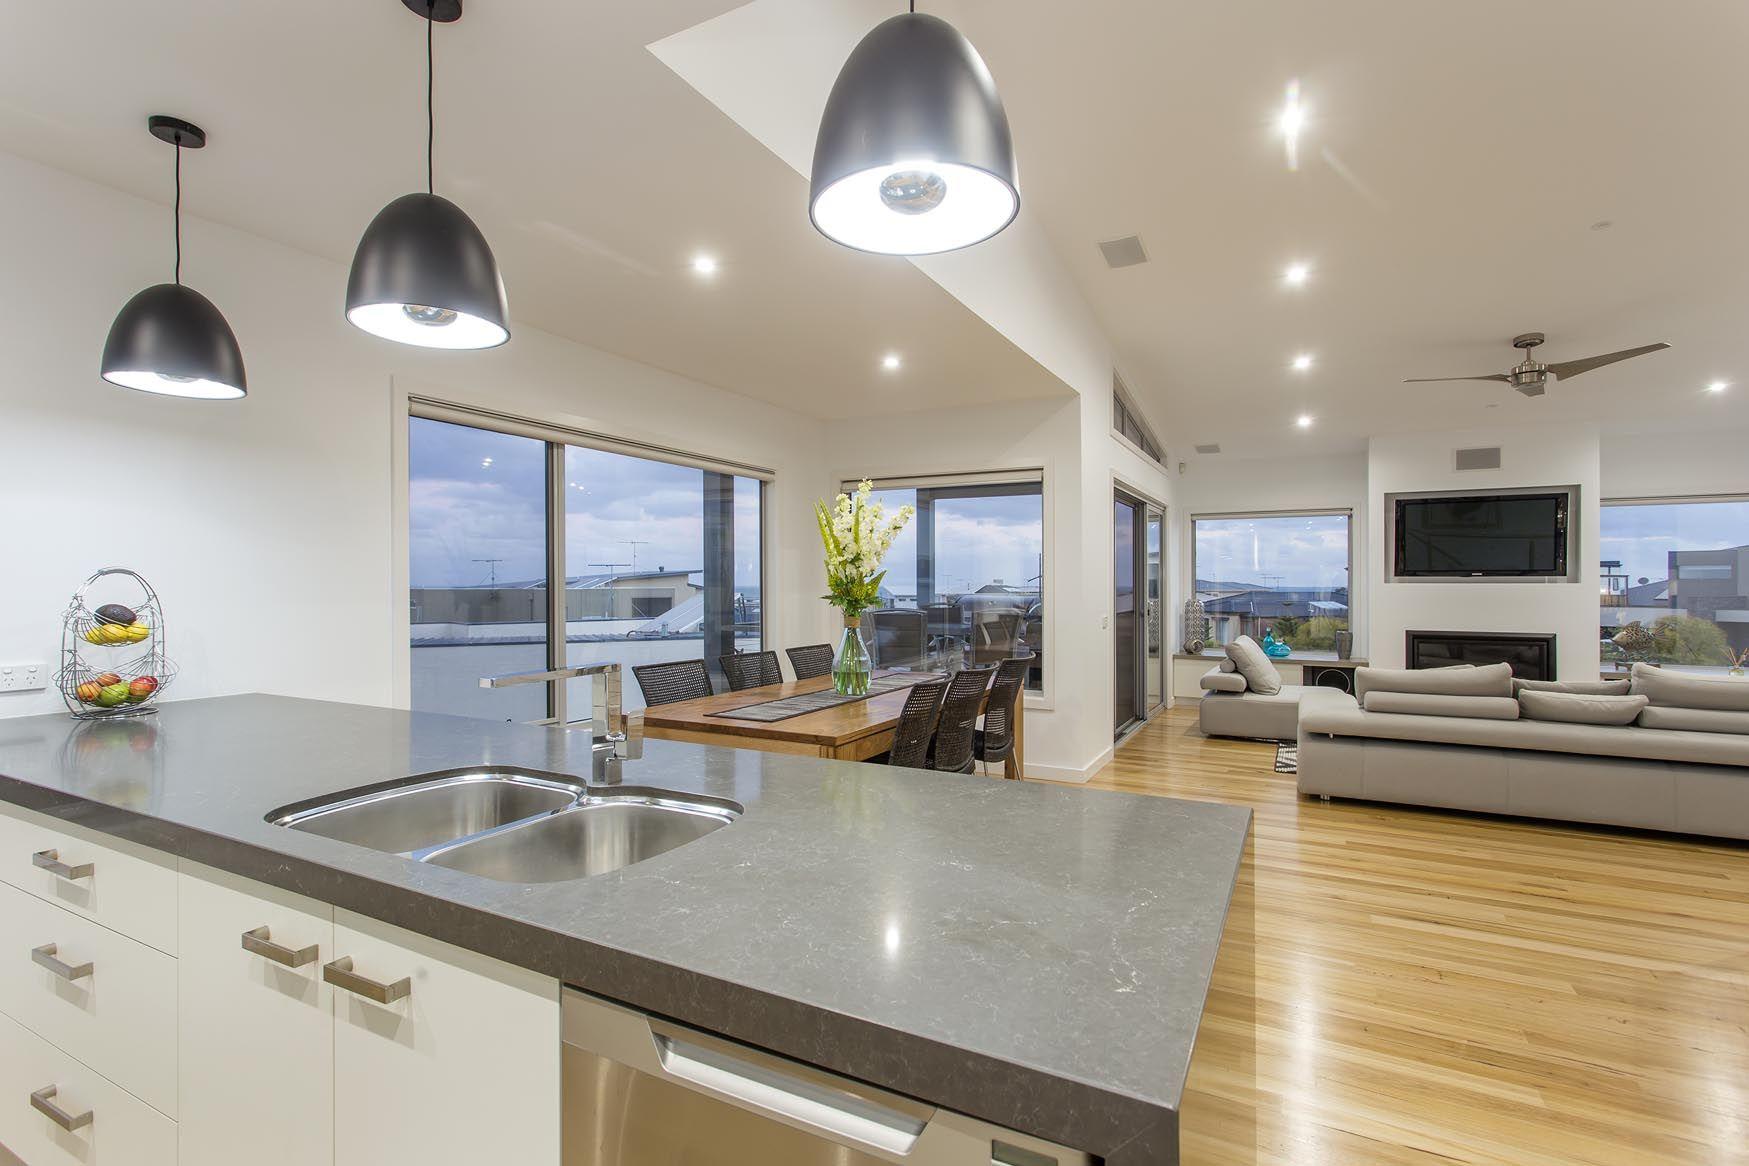 Torquay - | Kitchen pendant lighting, Home, Kitchen pendants